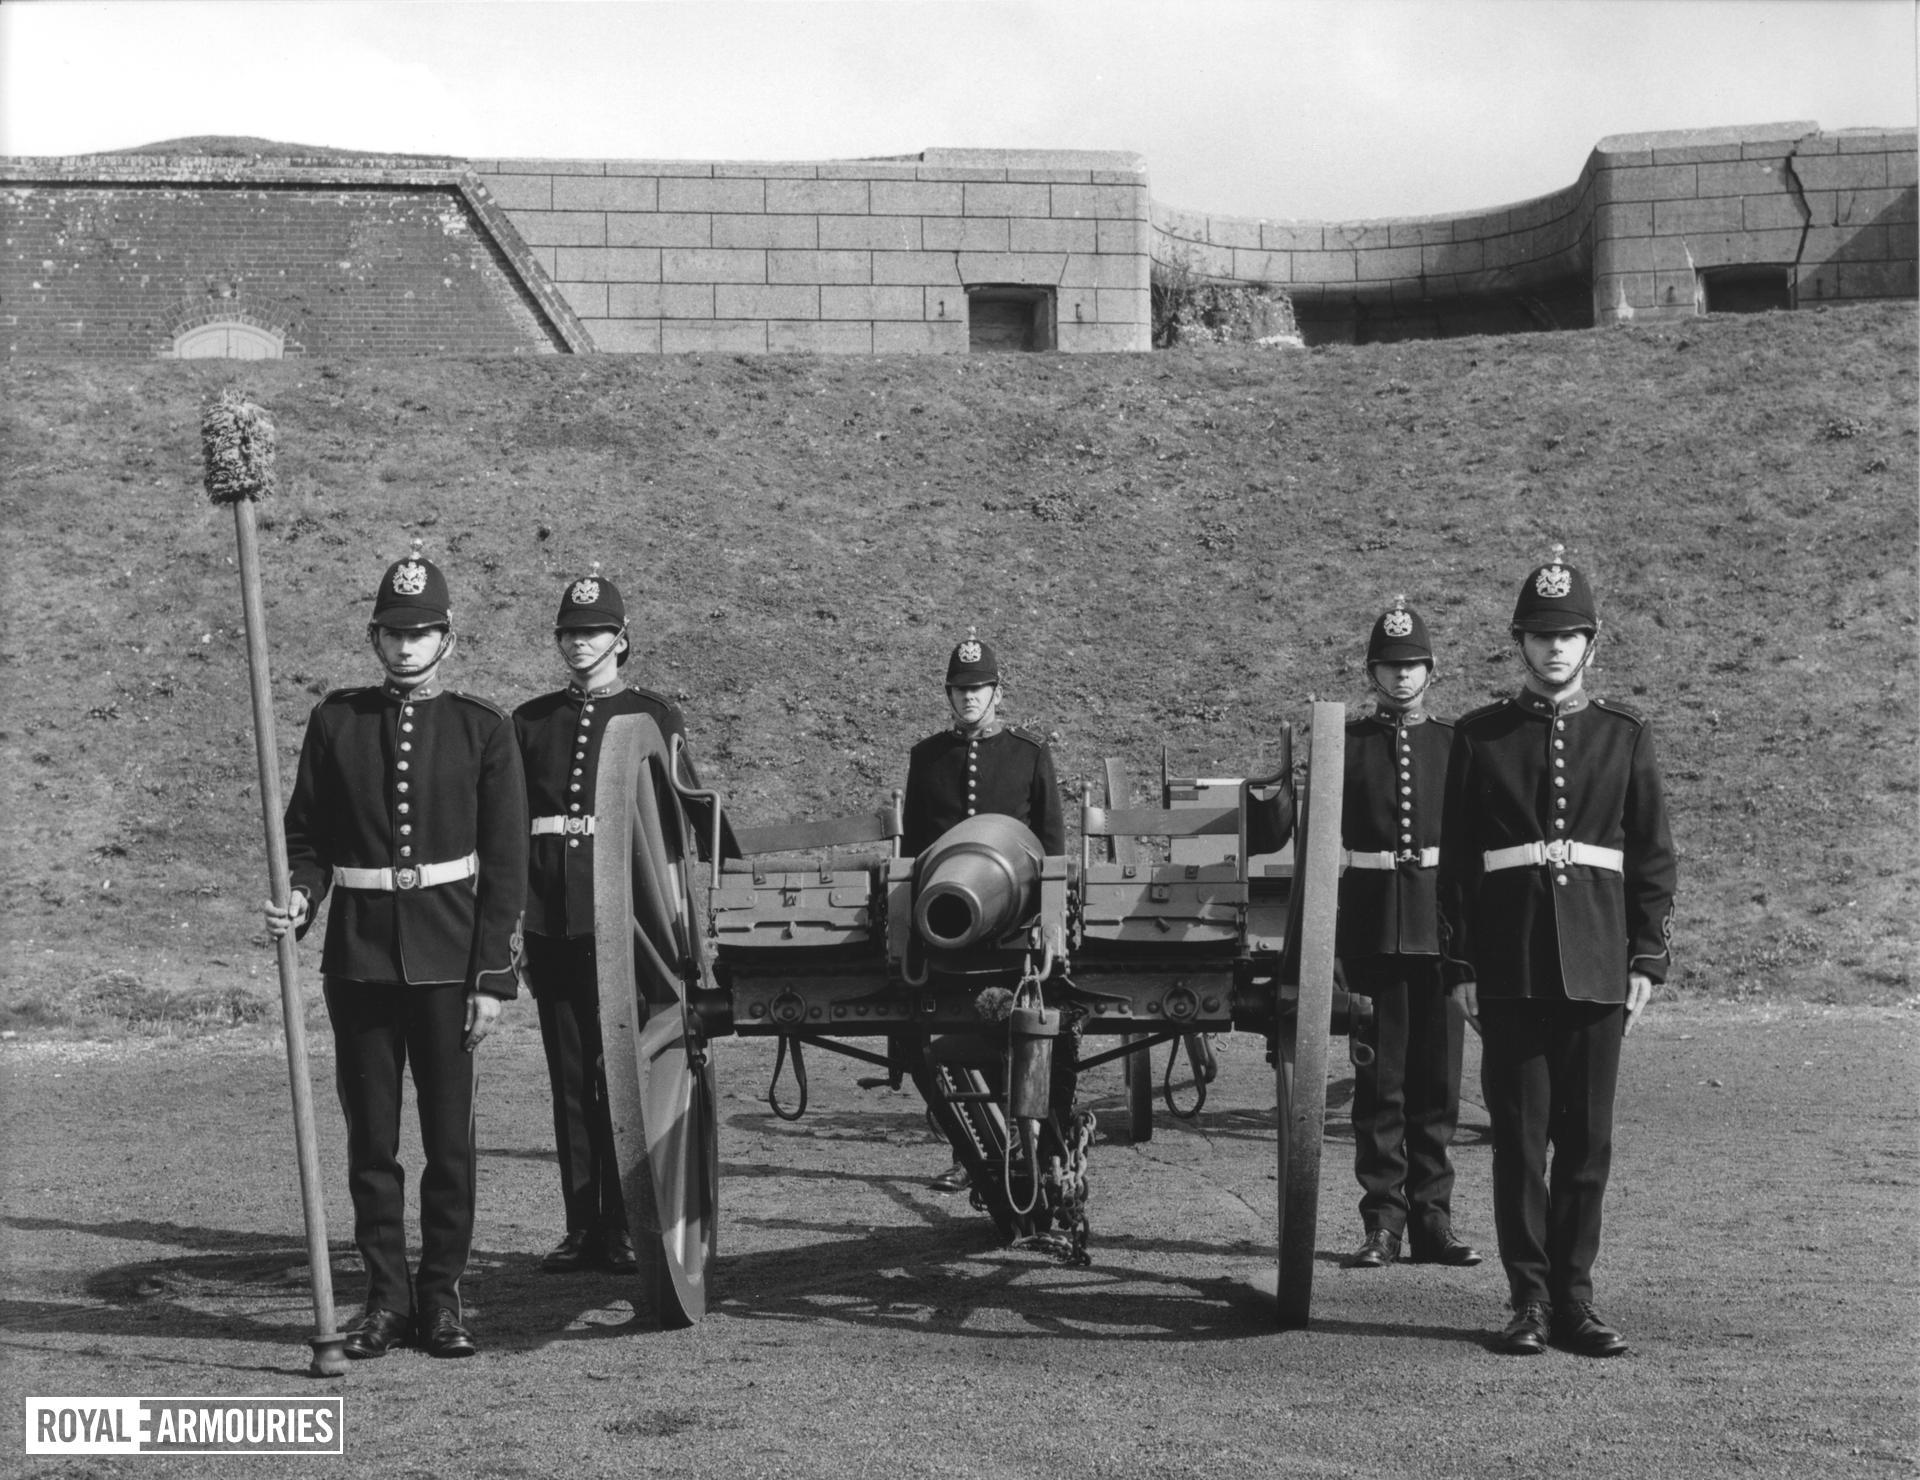 16 pr field gun and carriage - 16 pr RML